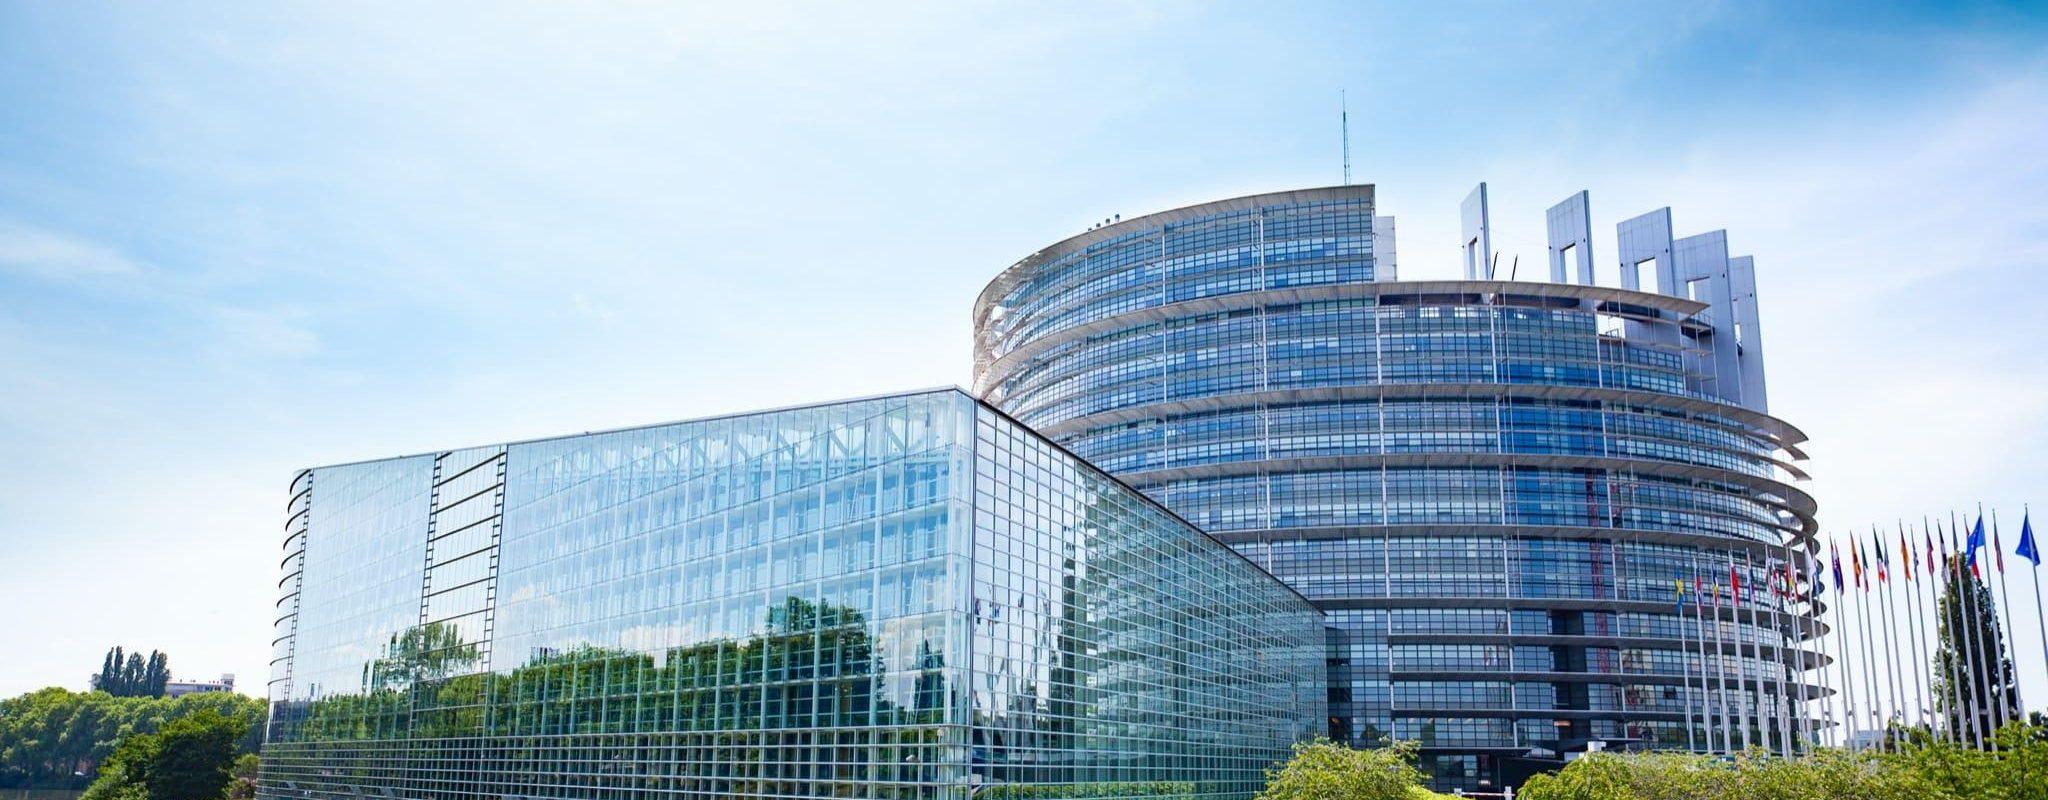 25 Jahre EU Beitritt 04_EU Basisbildung - 01 - AdobeStock_288939244_Editorial_Use_Only